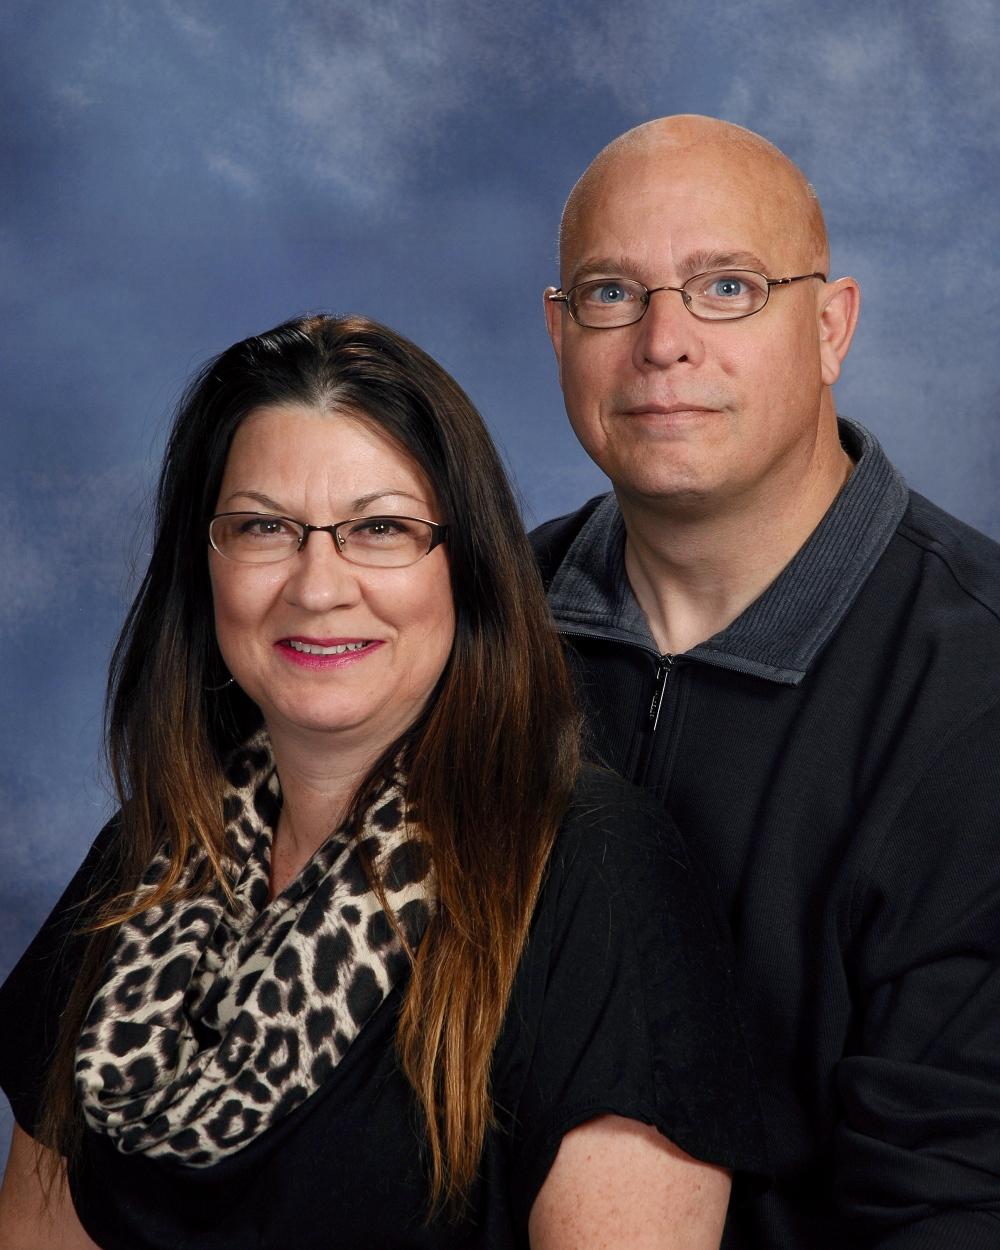 Kirk & Stacey Knoup, Custodians